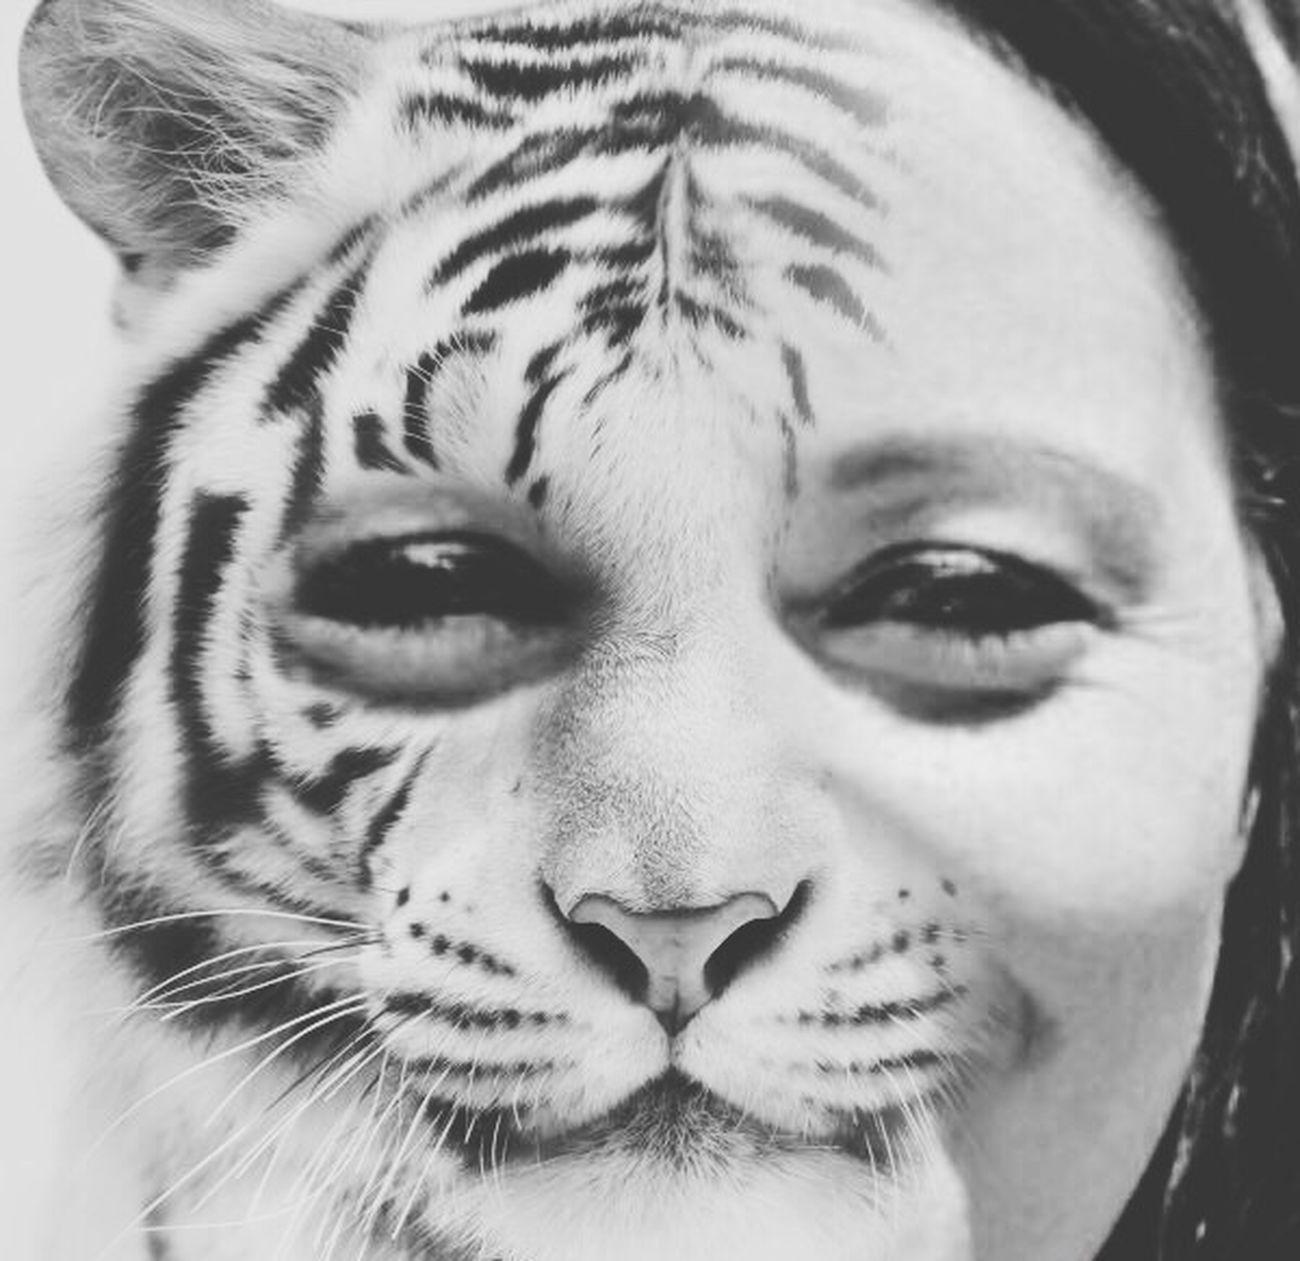 Faces Faces Of EyeEm Face Tiger Tiger-love Tiger Face Eeyem Black And White Black&white Blackandwhitephotography Eyeemphotography Eeyemgallery Editorial  Editing Edited Edit EyeEmBestPics Eeyem Photography (null)Black And White Photography Black And White Collection  EyeEm Best Shots EeYem Best Shots